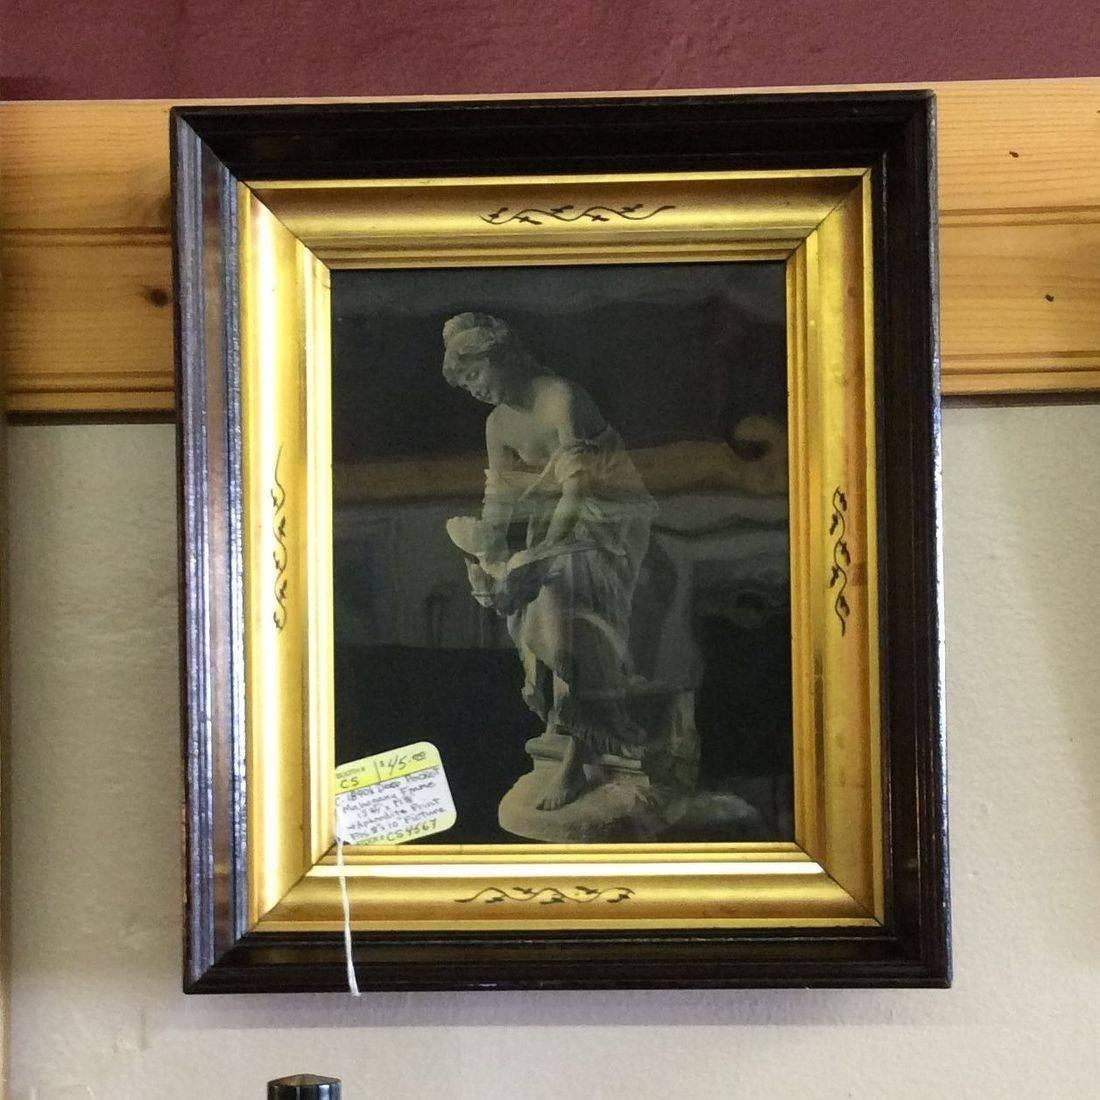 "C. 1890's Deep Pocket Frame w/Aphrodite Print  13-3/4"" x 11-7/8""  fits 8"" x 10"" pic.  $45.00"